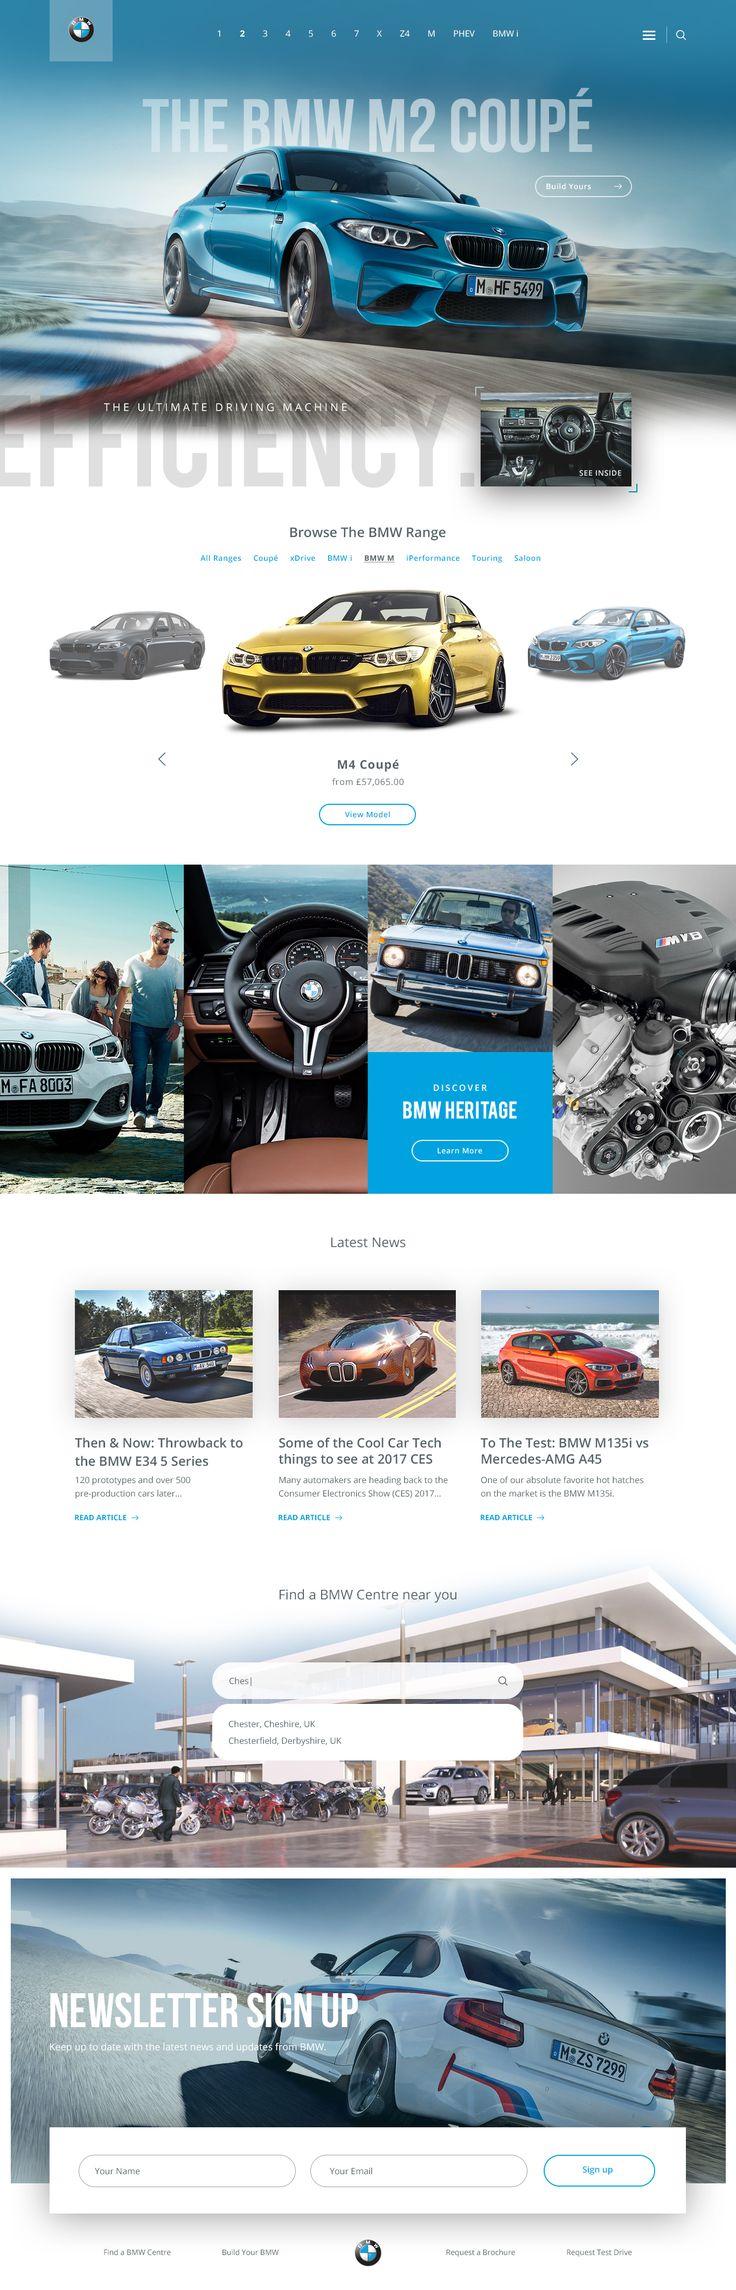 634 best Web design images on Pinterest   Web layout, Website ...